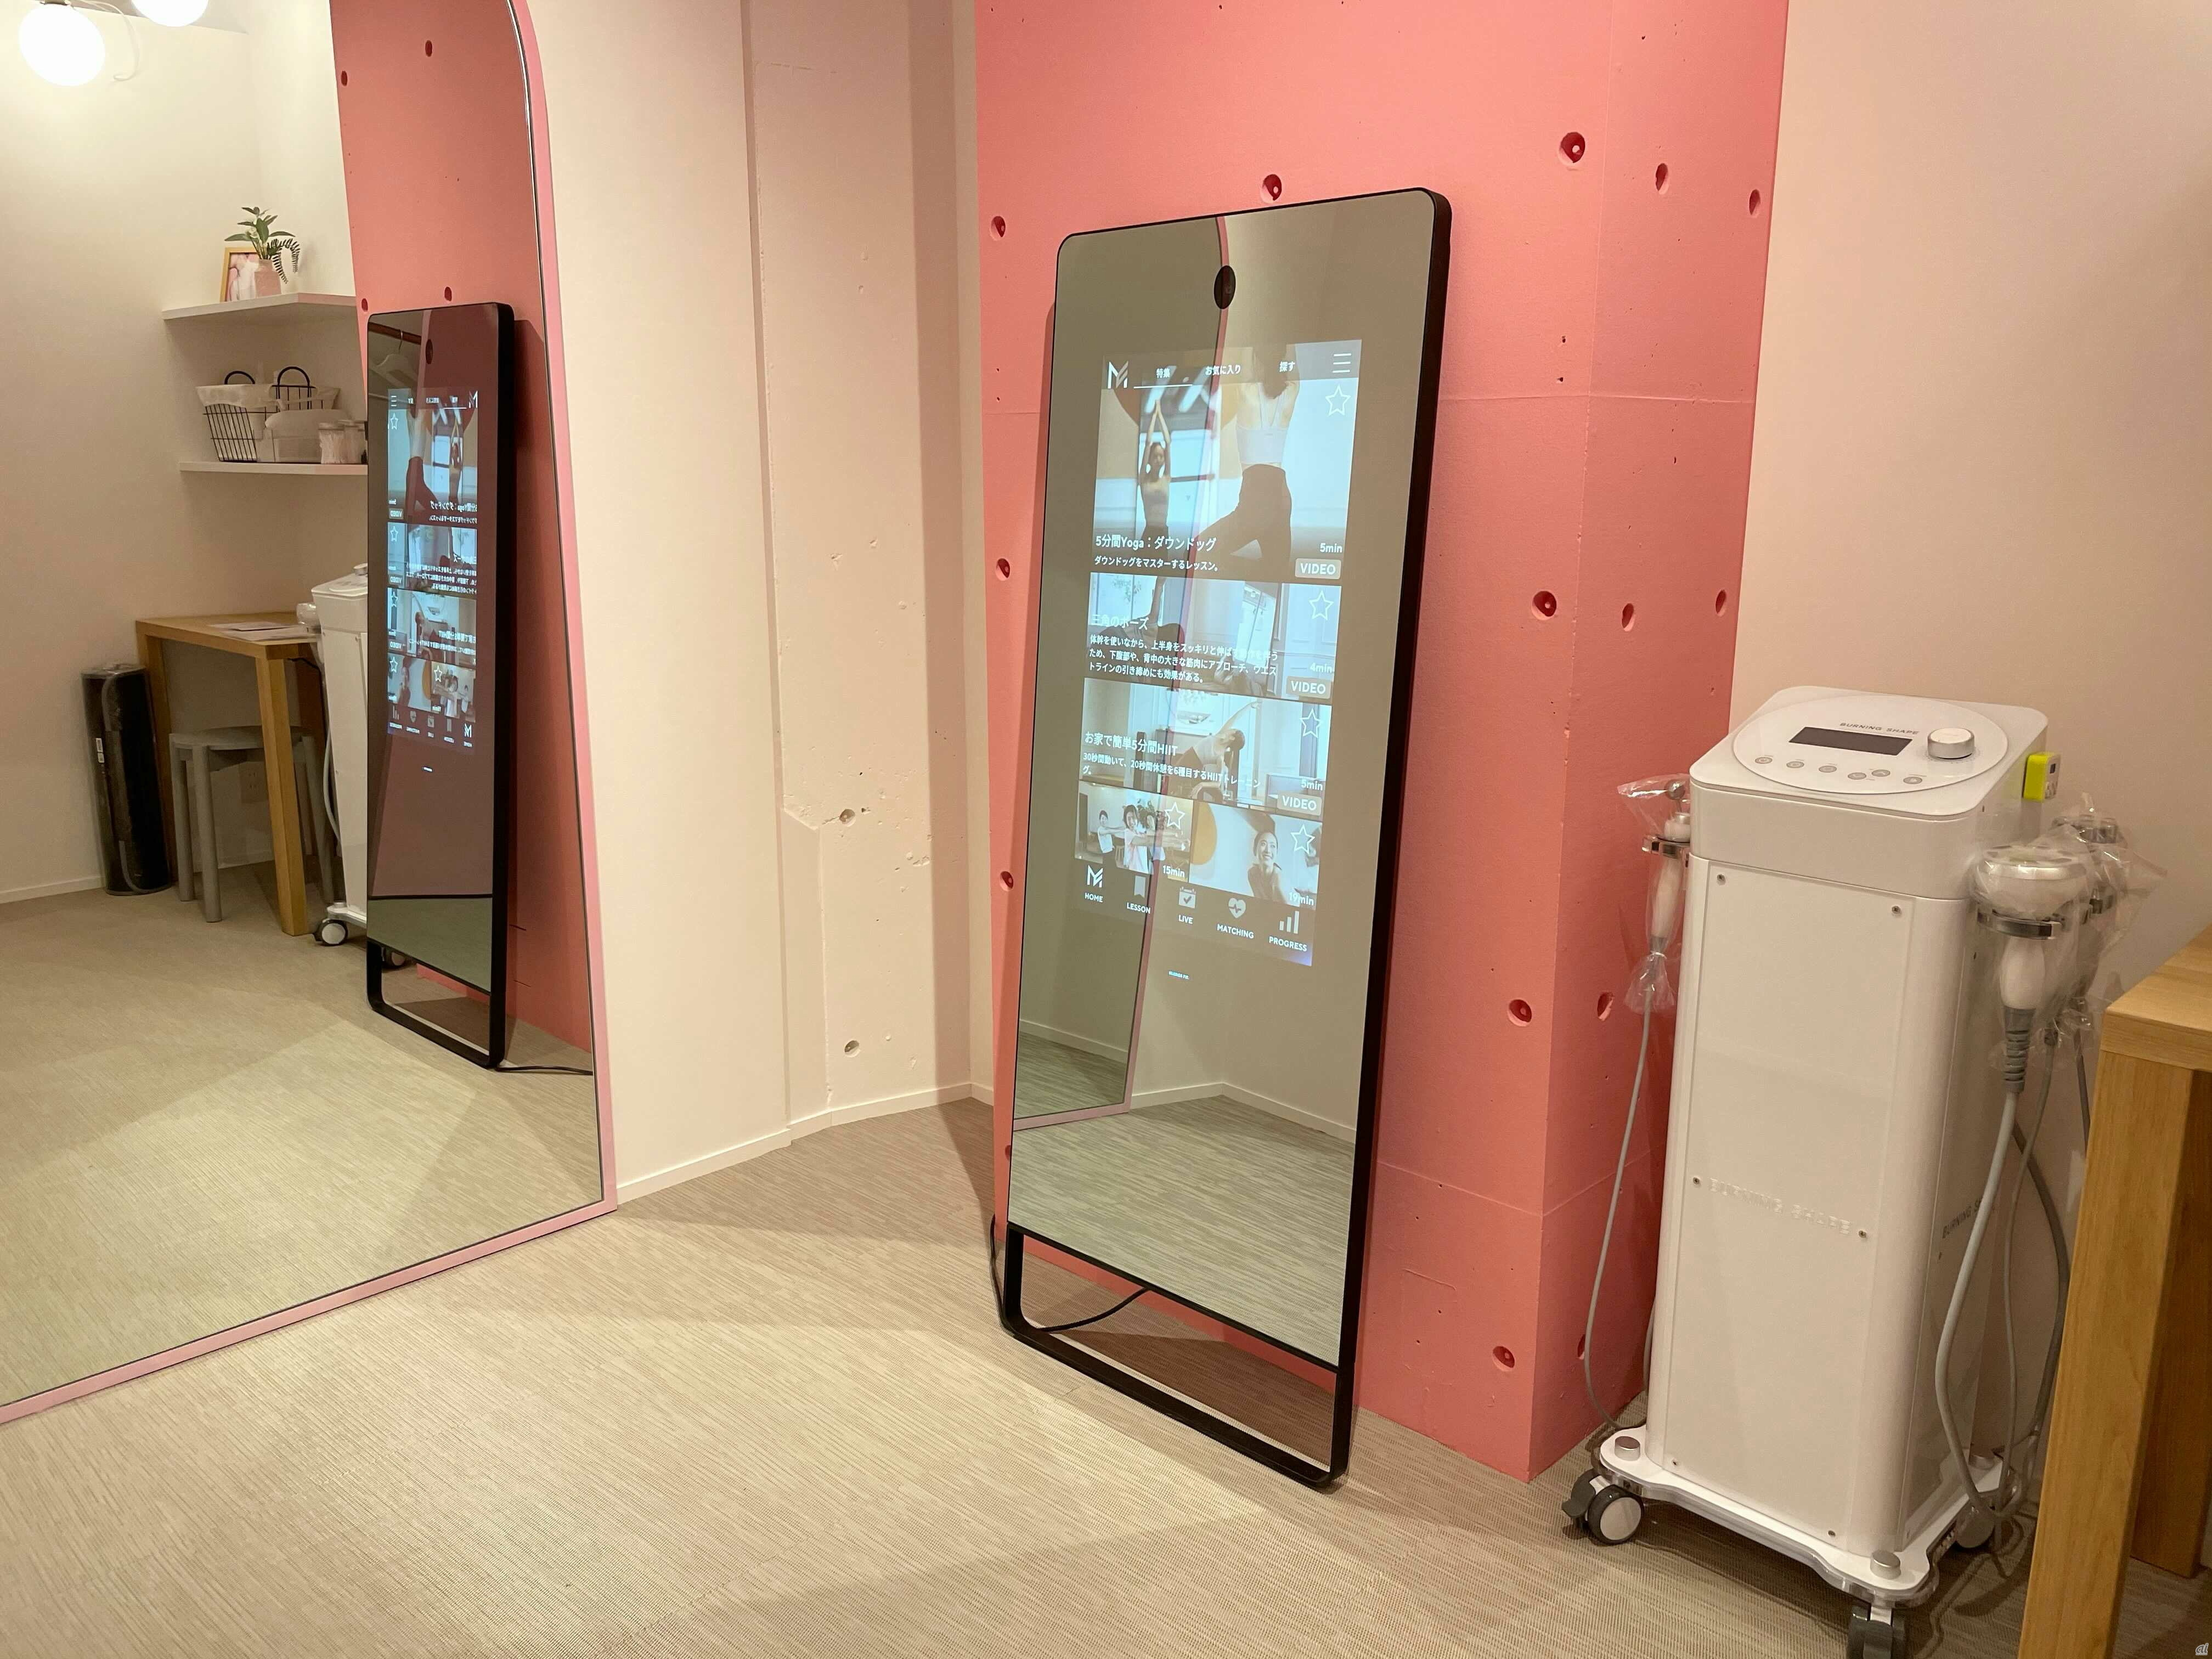 IoTミラーデバイス「MIRROR FIT.」を導入した完全個室型